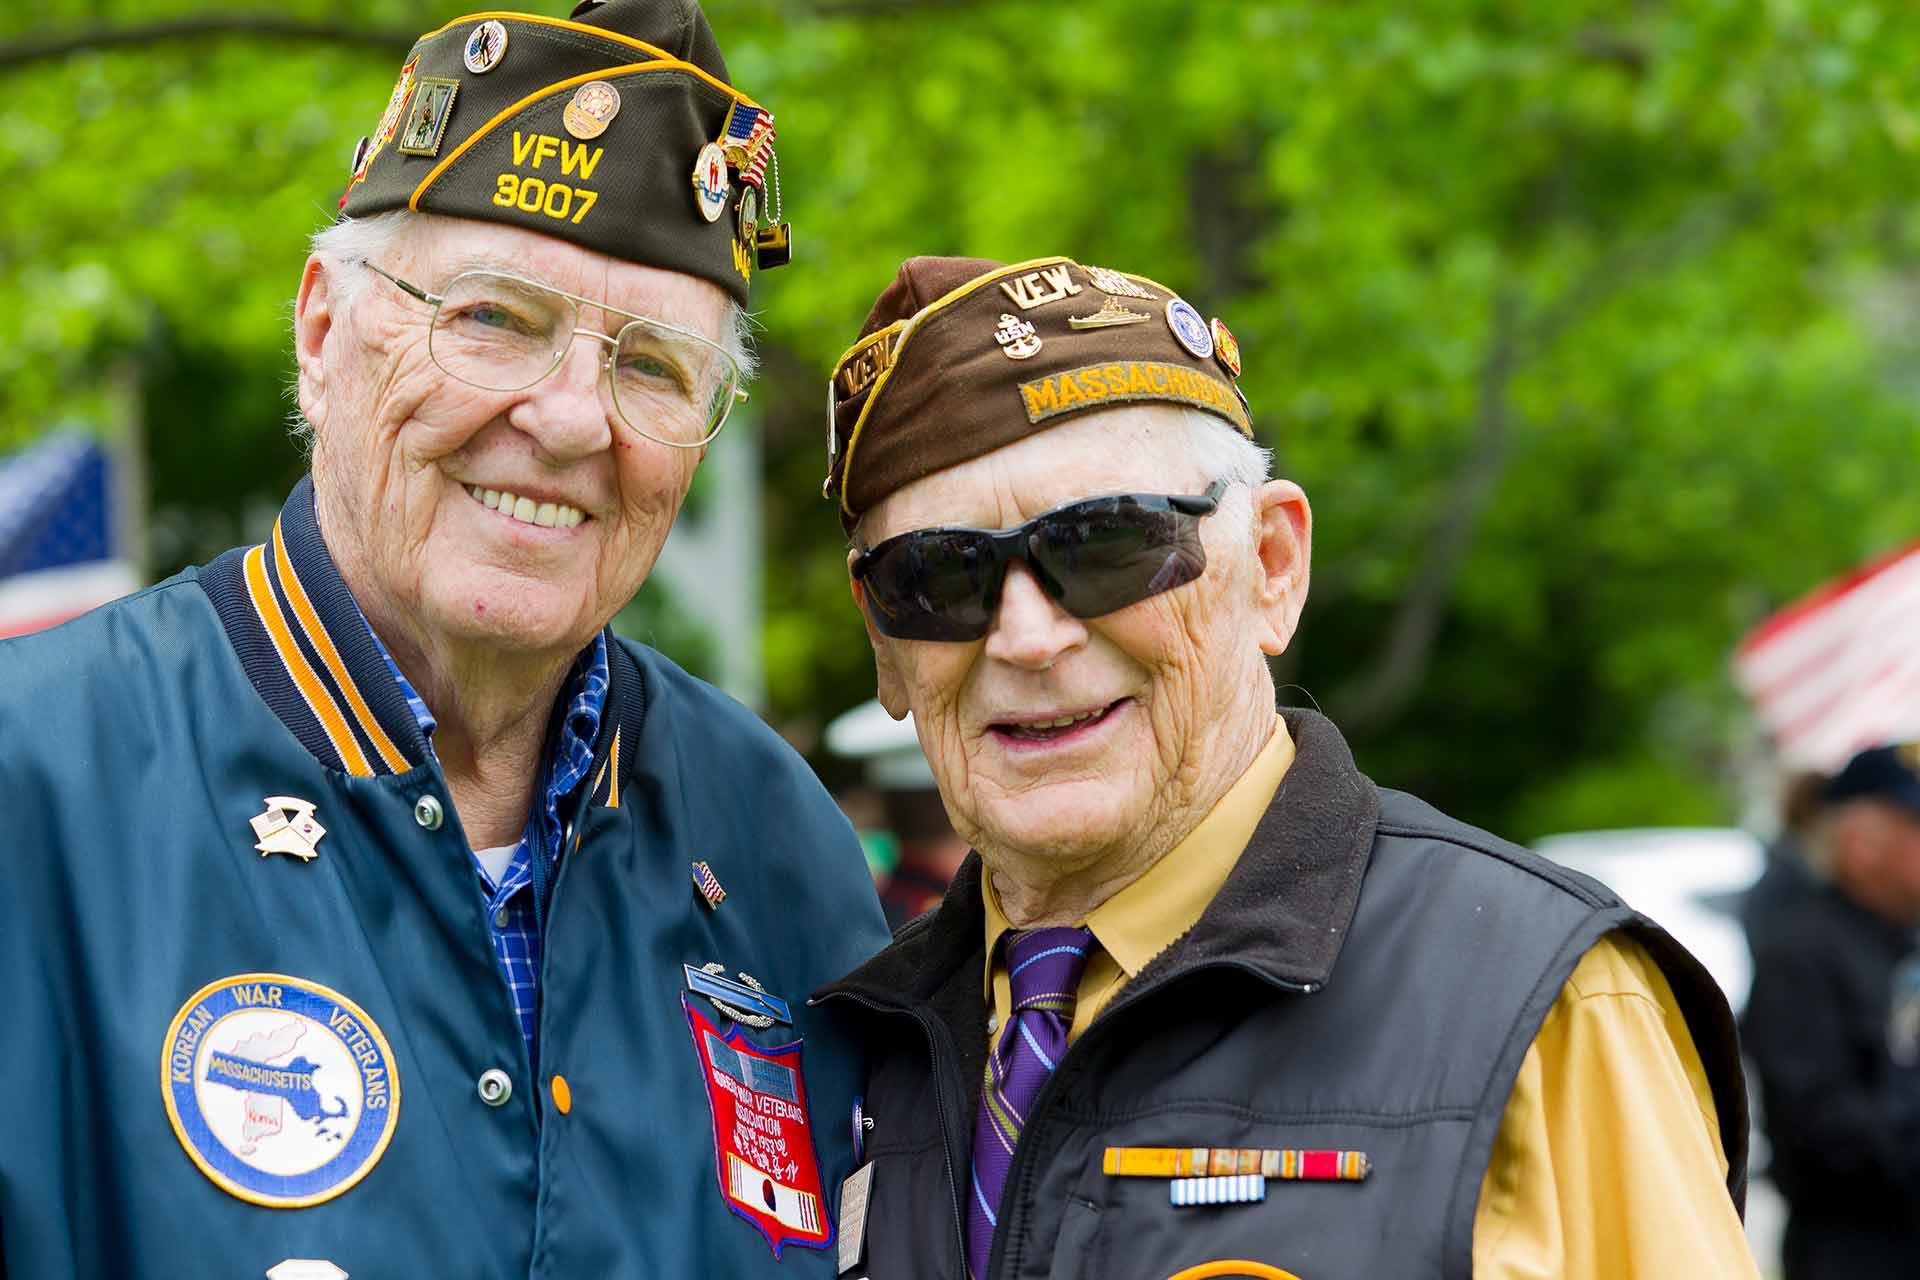 Image of proud veterans